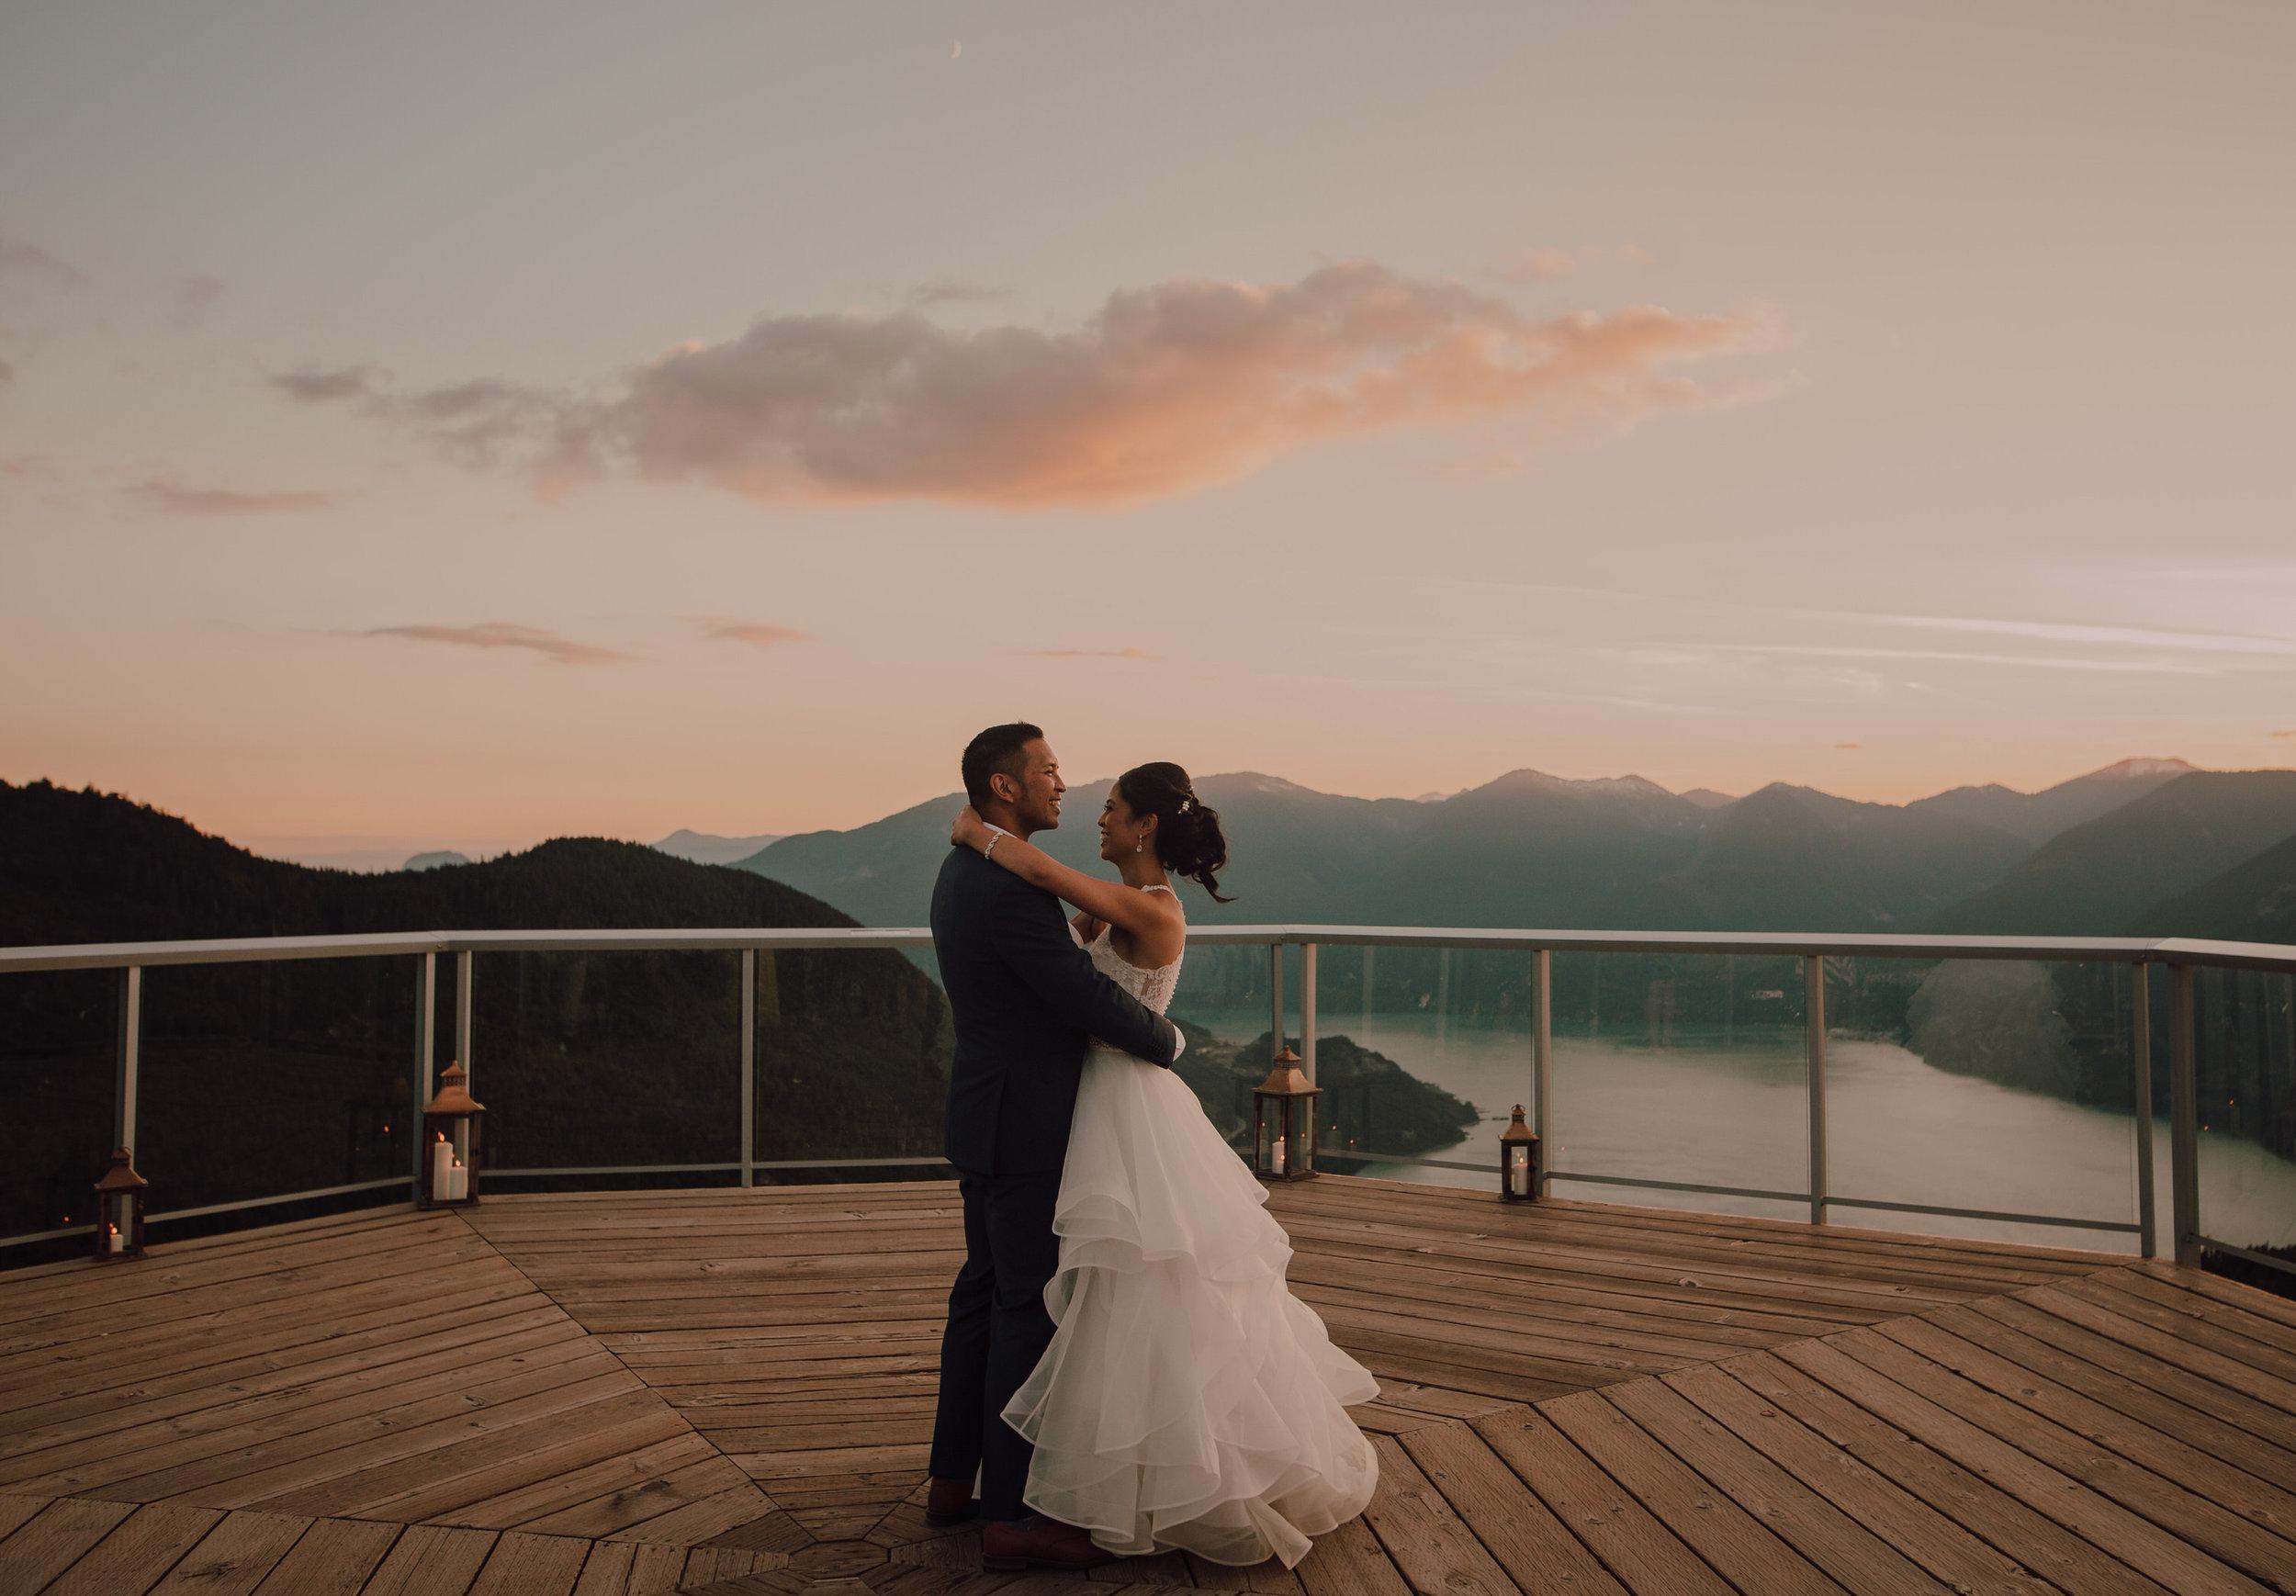 Squamish Wedding Photographer - Sea to Sky Gondola Wedding Photos -  Vancouver Wedding Photographer & Videographer - Sunshine Coast Wedding Photos - Sunshine Coast Wedding Photographer - Jennifer Picard Photography - IMG_5398.jpg